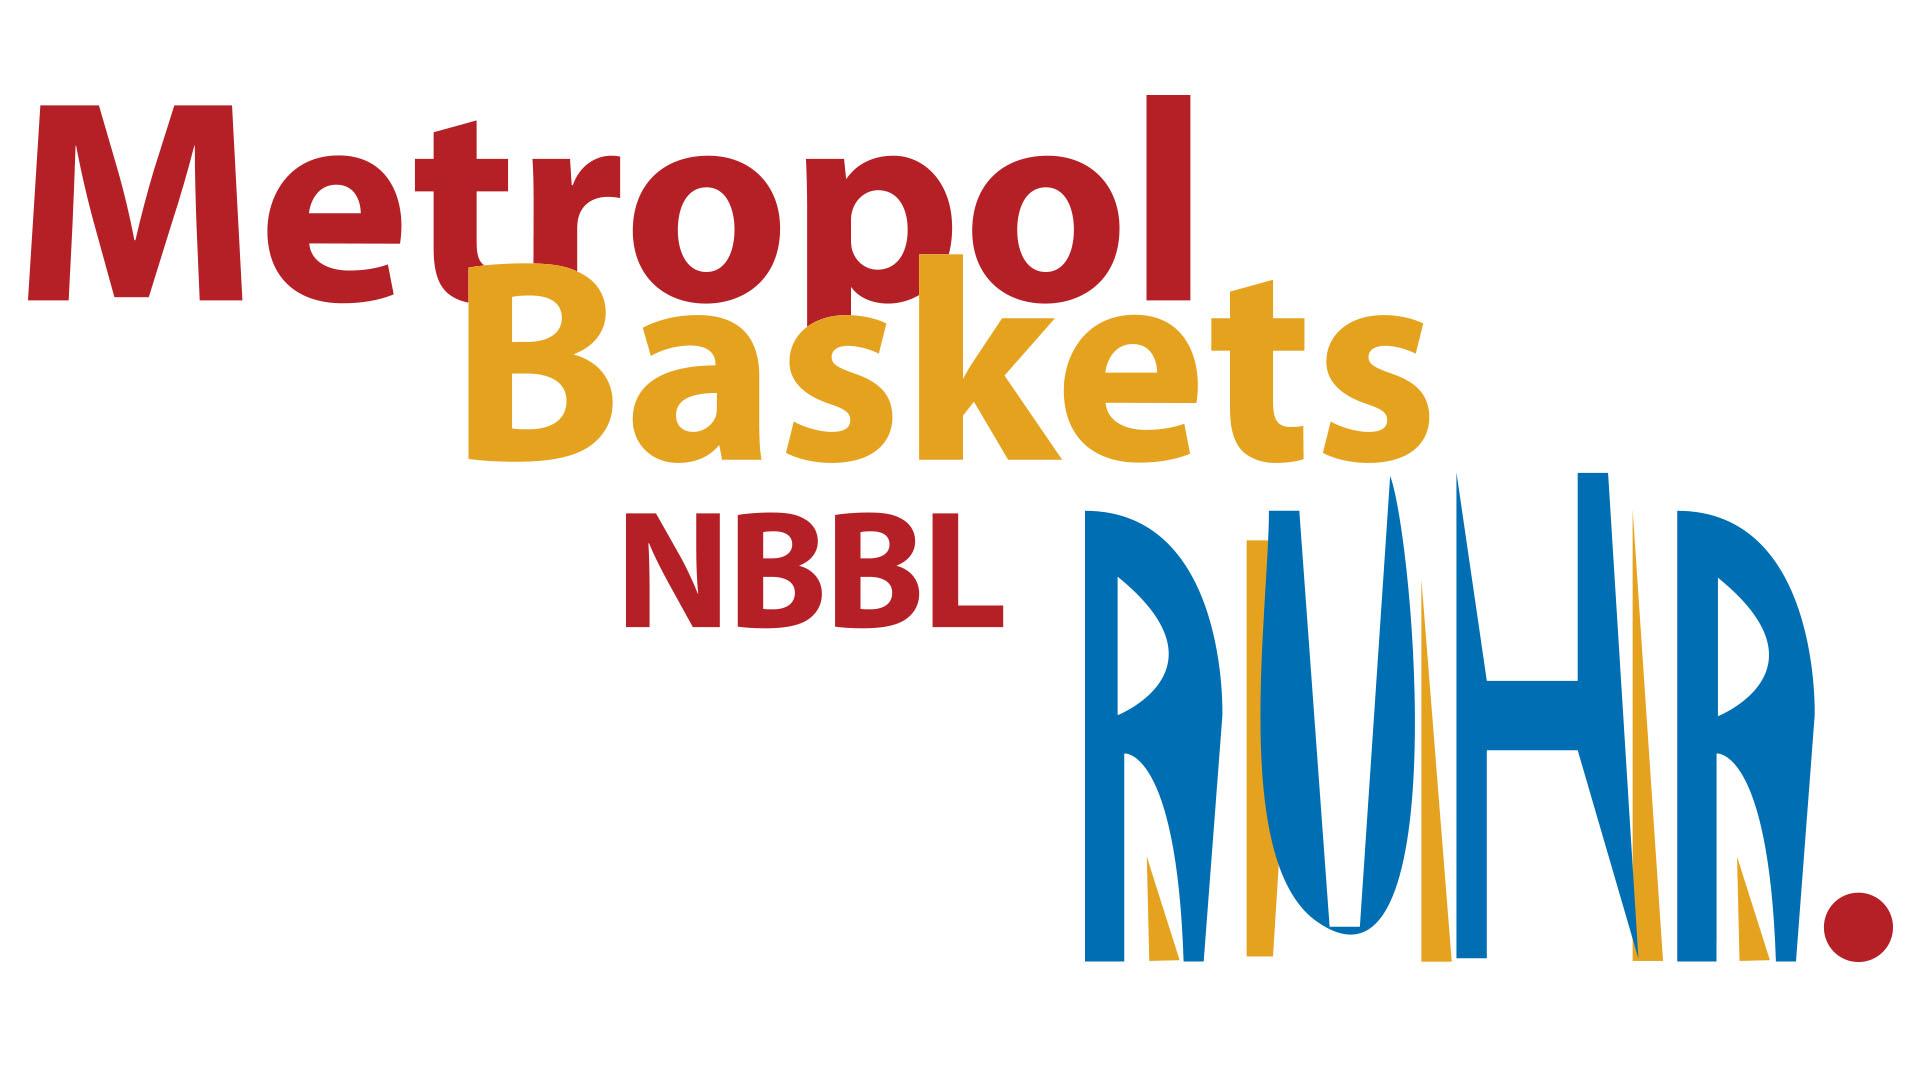 Metropol-Baskets-Ruhr_NBBL-1